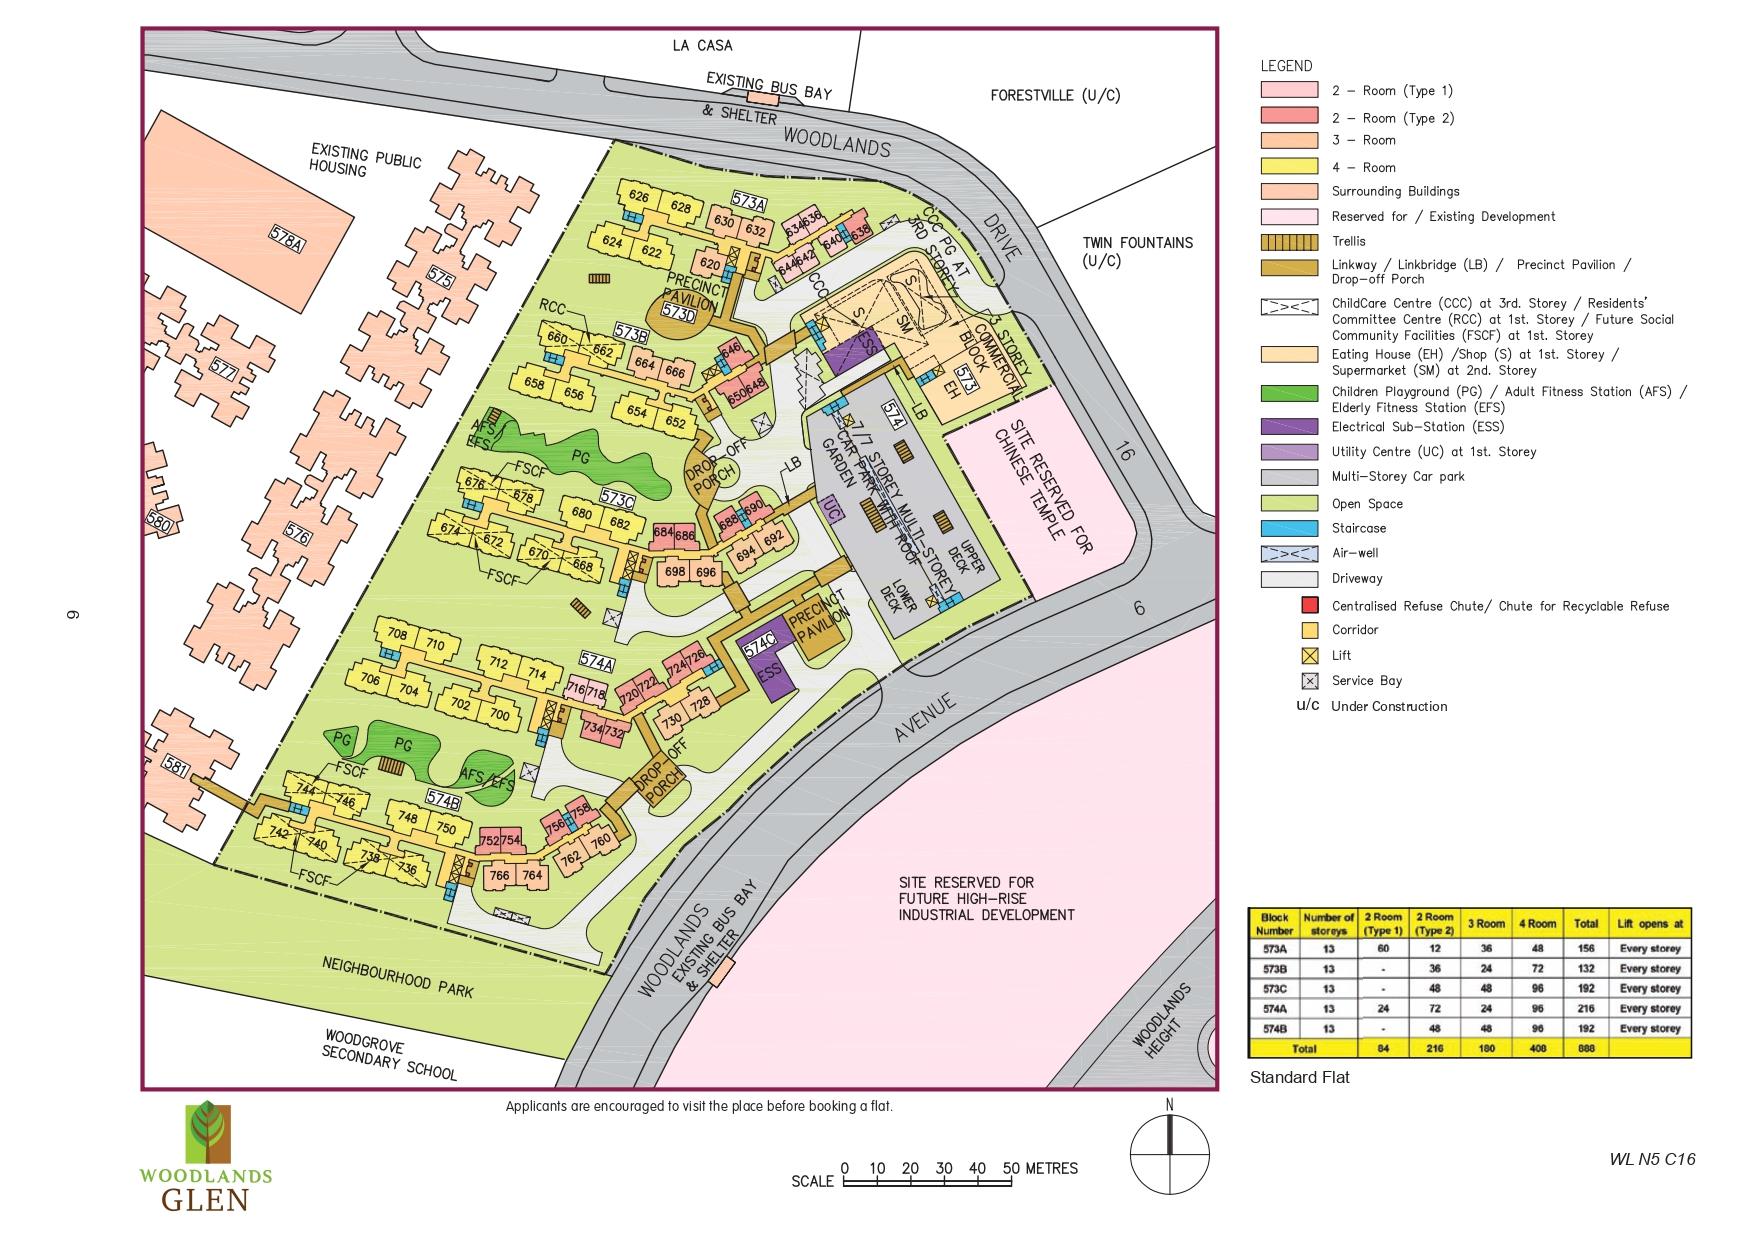 Woodlands Glen Site Plan